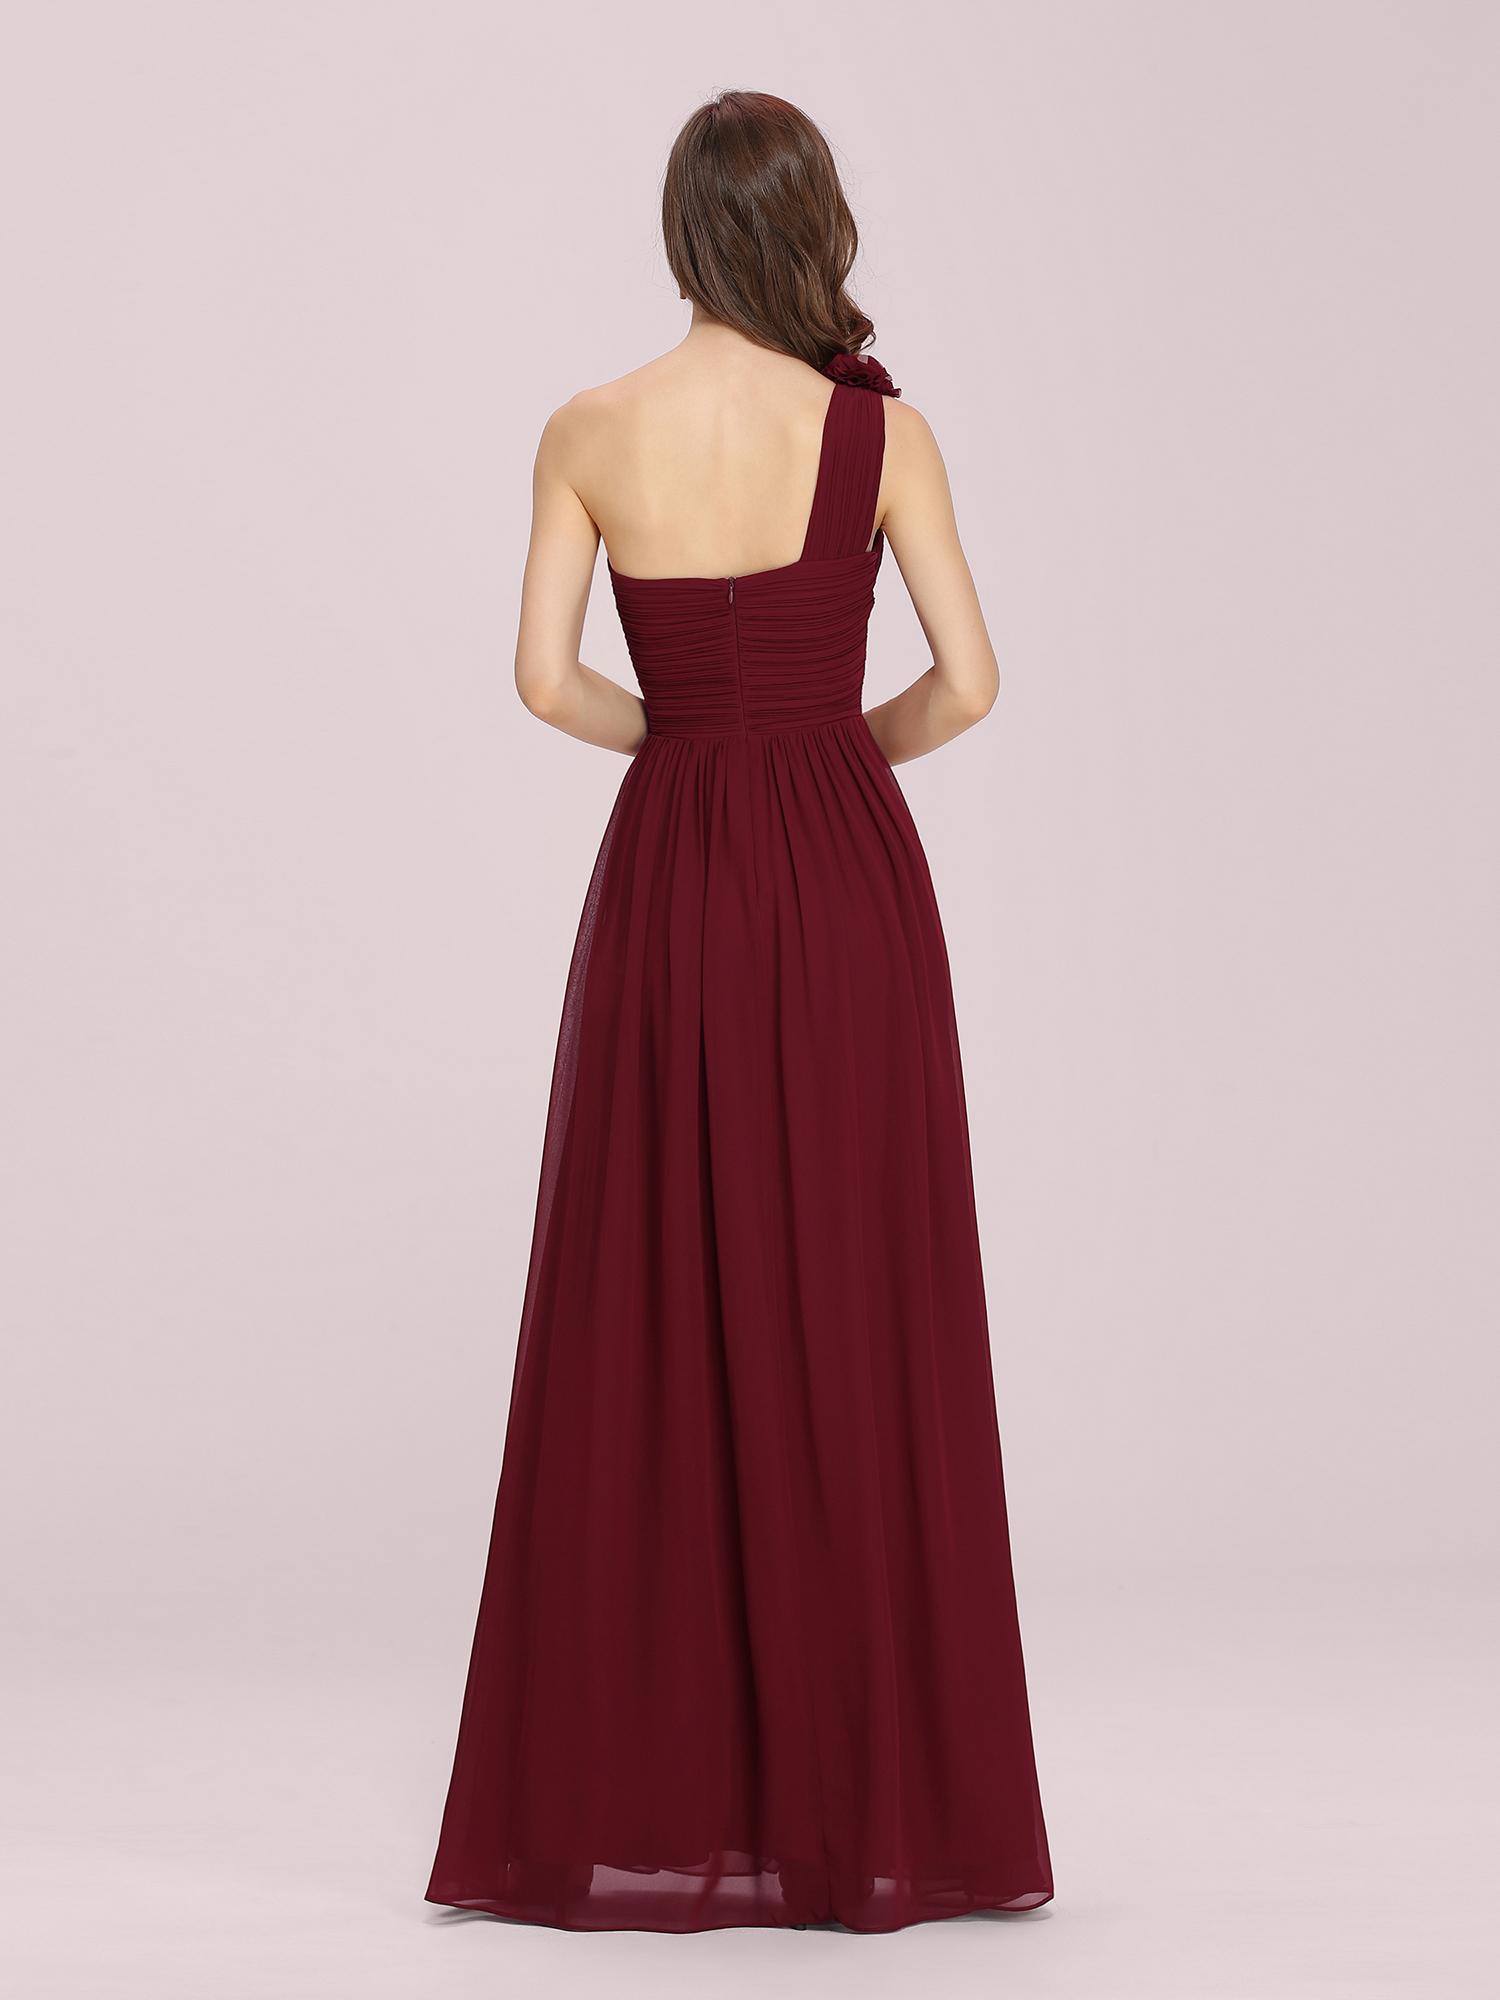 Ever-Pretty-US-Long-Bridesmaid-Dresses-One-Shoulder-Evening-Party-Dresses-08237 thumbnail 17